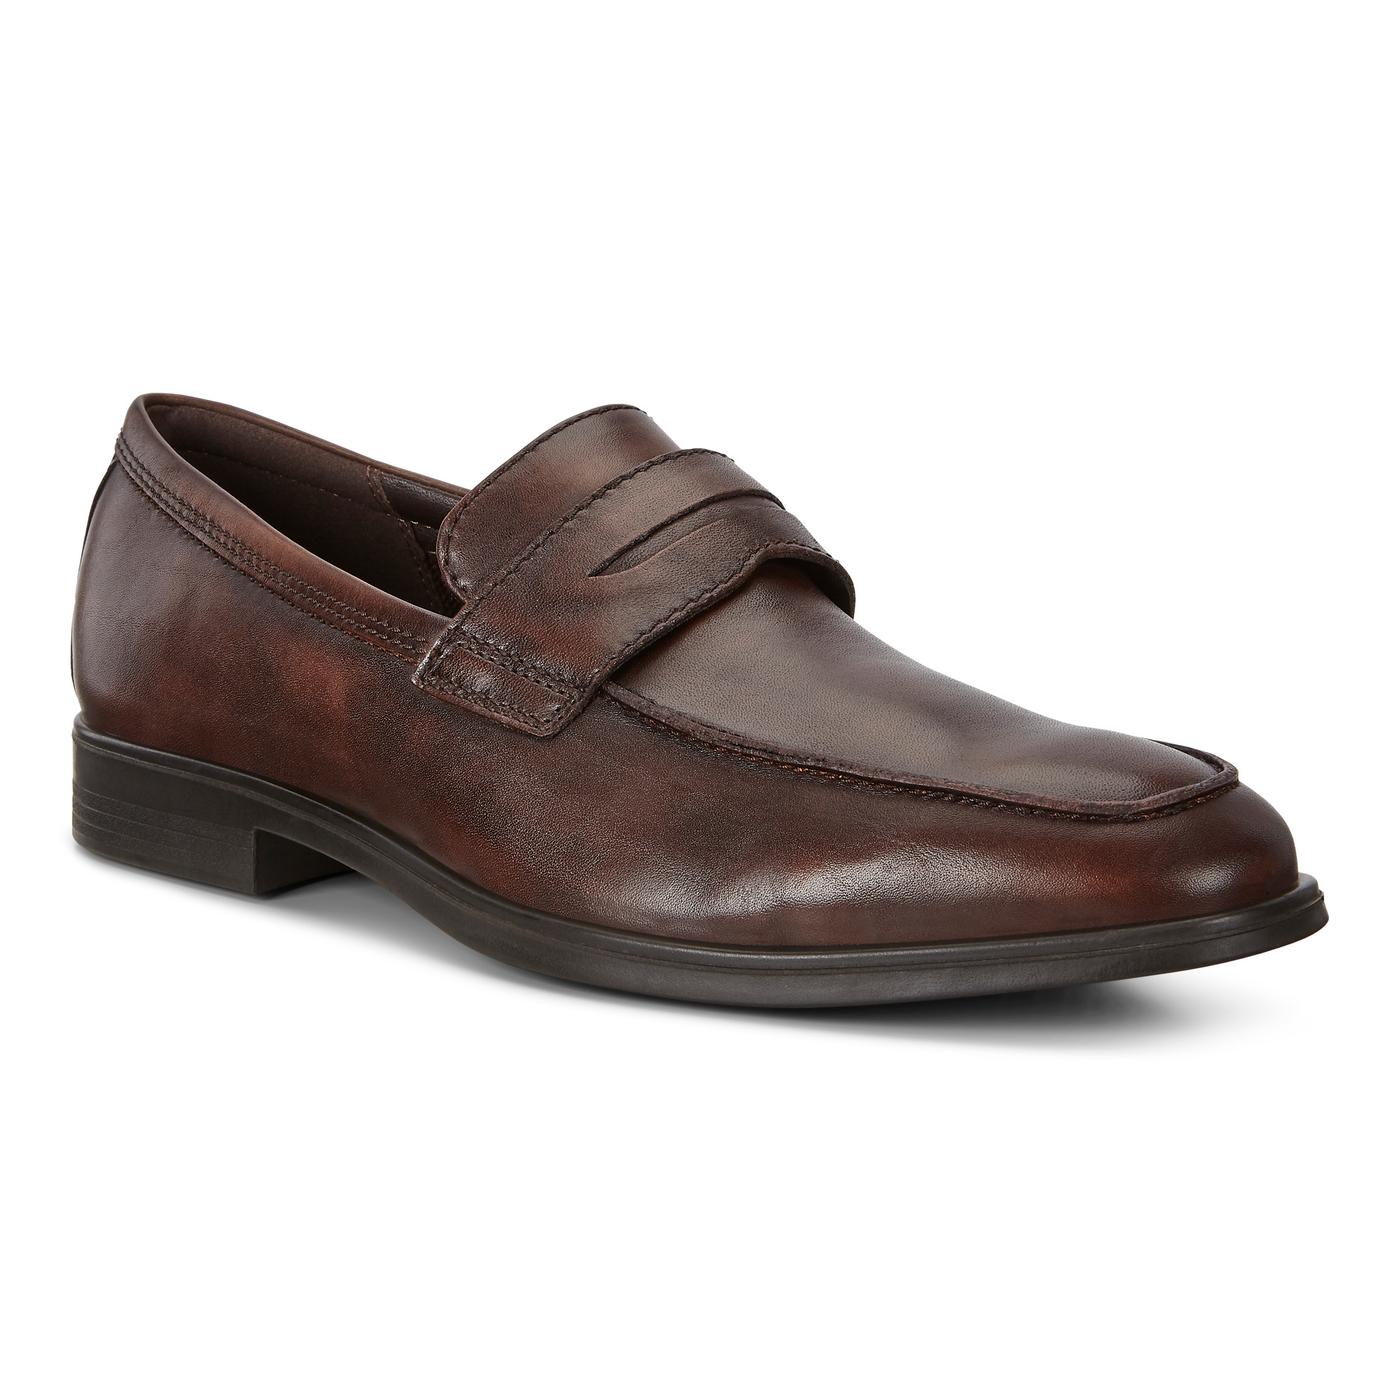 ECCO Men's Melbourne Loafer Cocoa Brown Leather